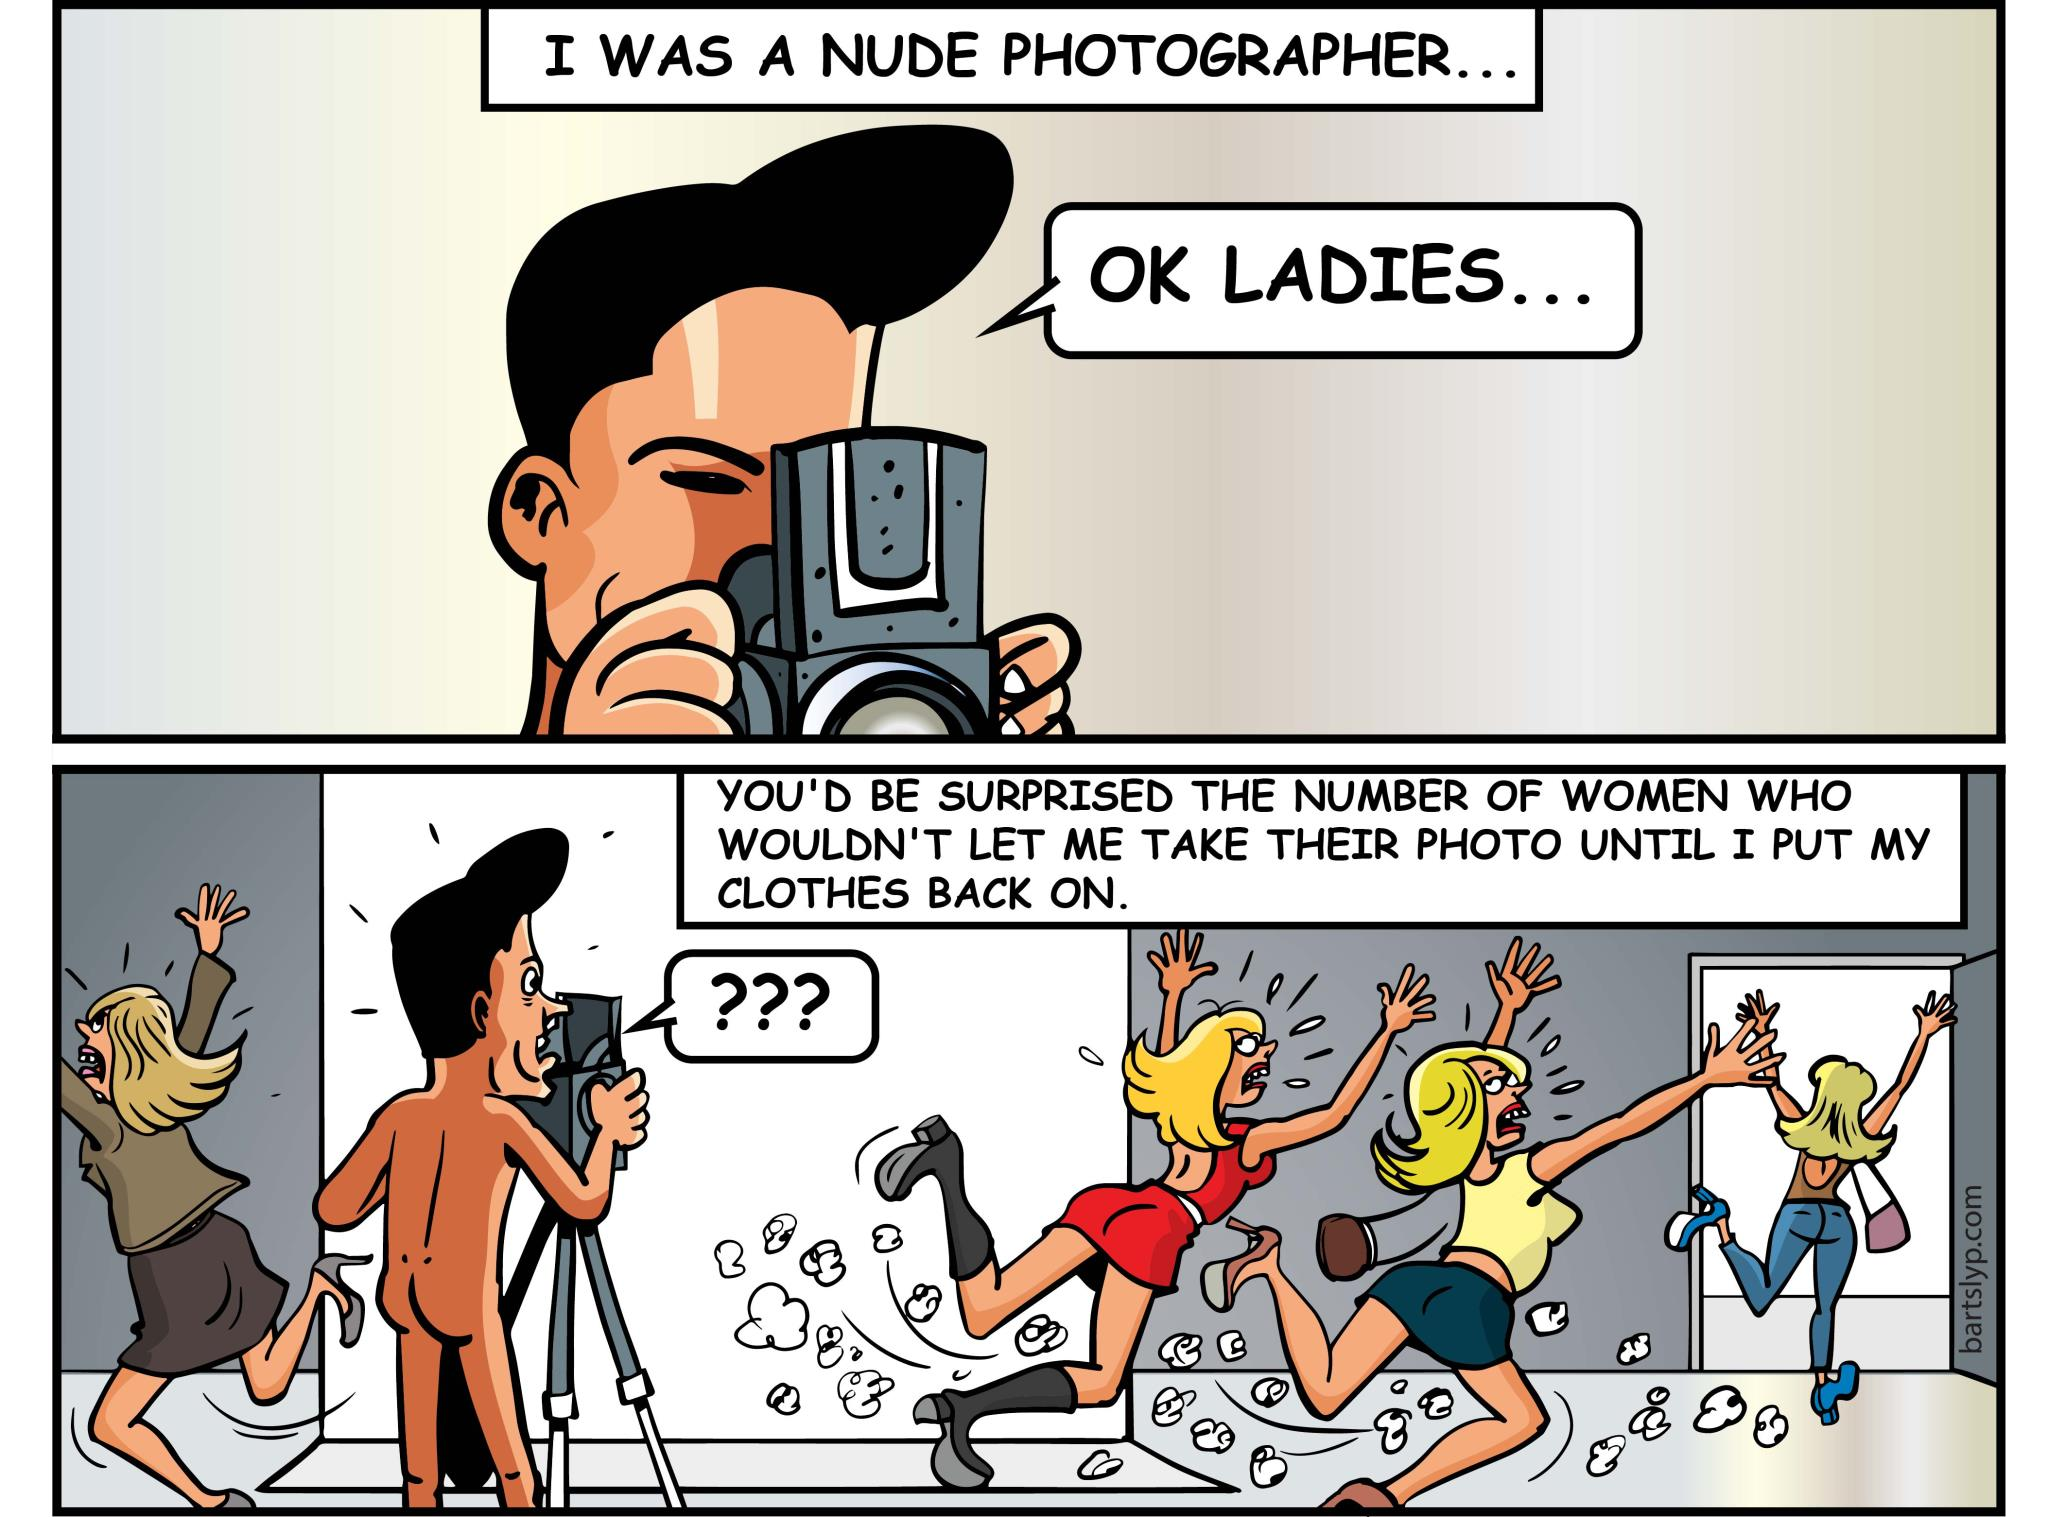 Weiss_Nude Photographer